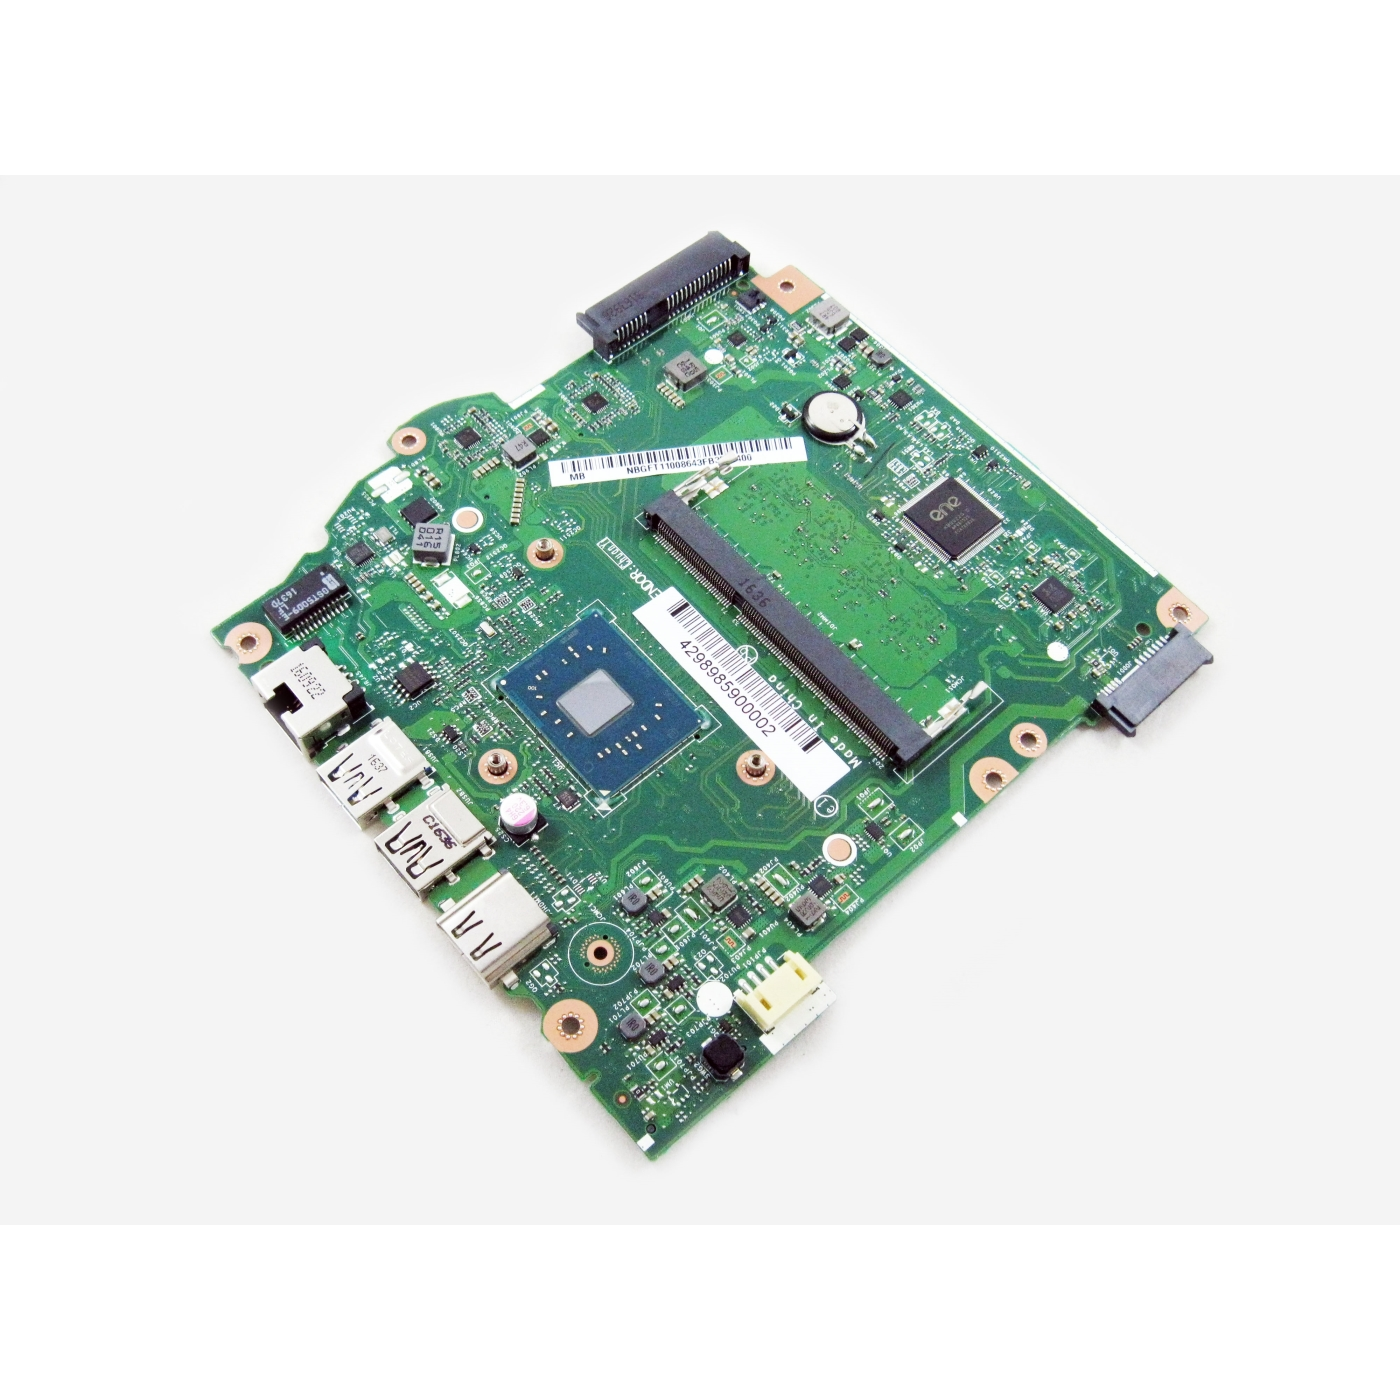 Acer NB.GFT11.008 Aspire ES1-533 EasyNote N3340 Uma 2GB Notebook Motherboard